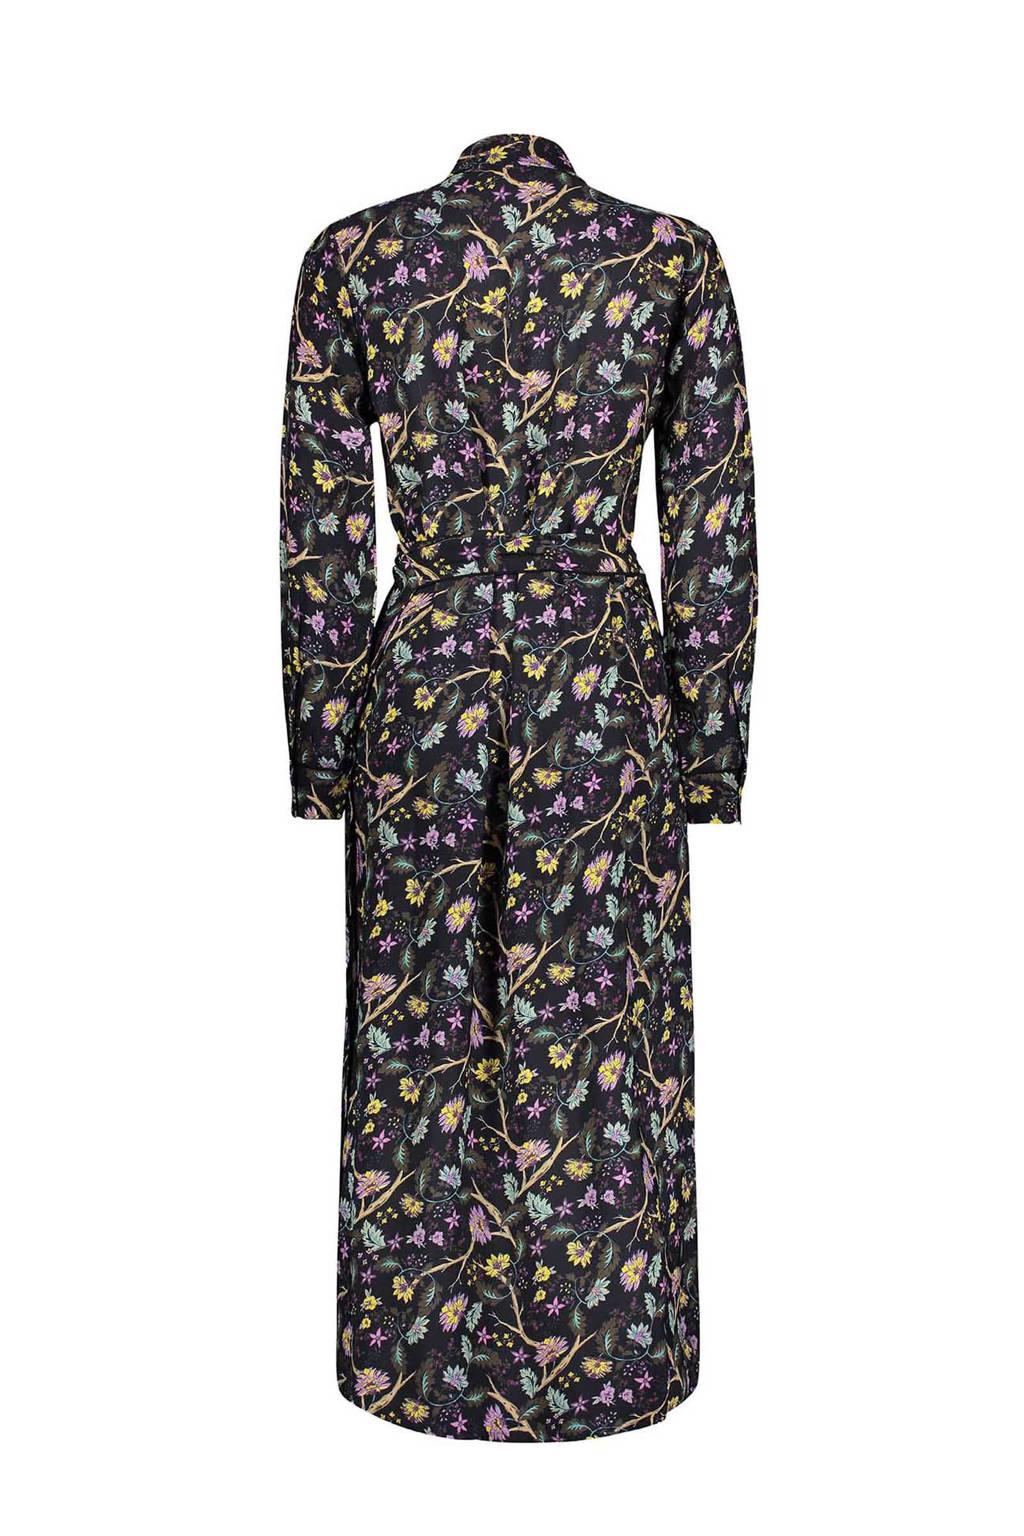 5d399ac83c3a81 Sissy-Boy overslag jurk met bloemenprint